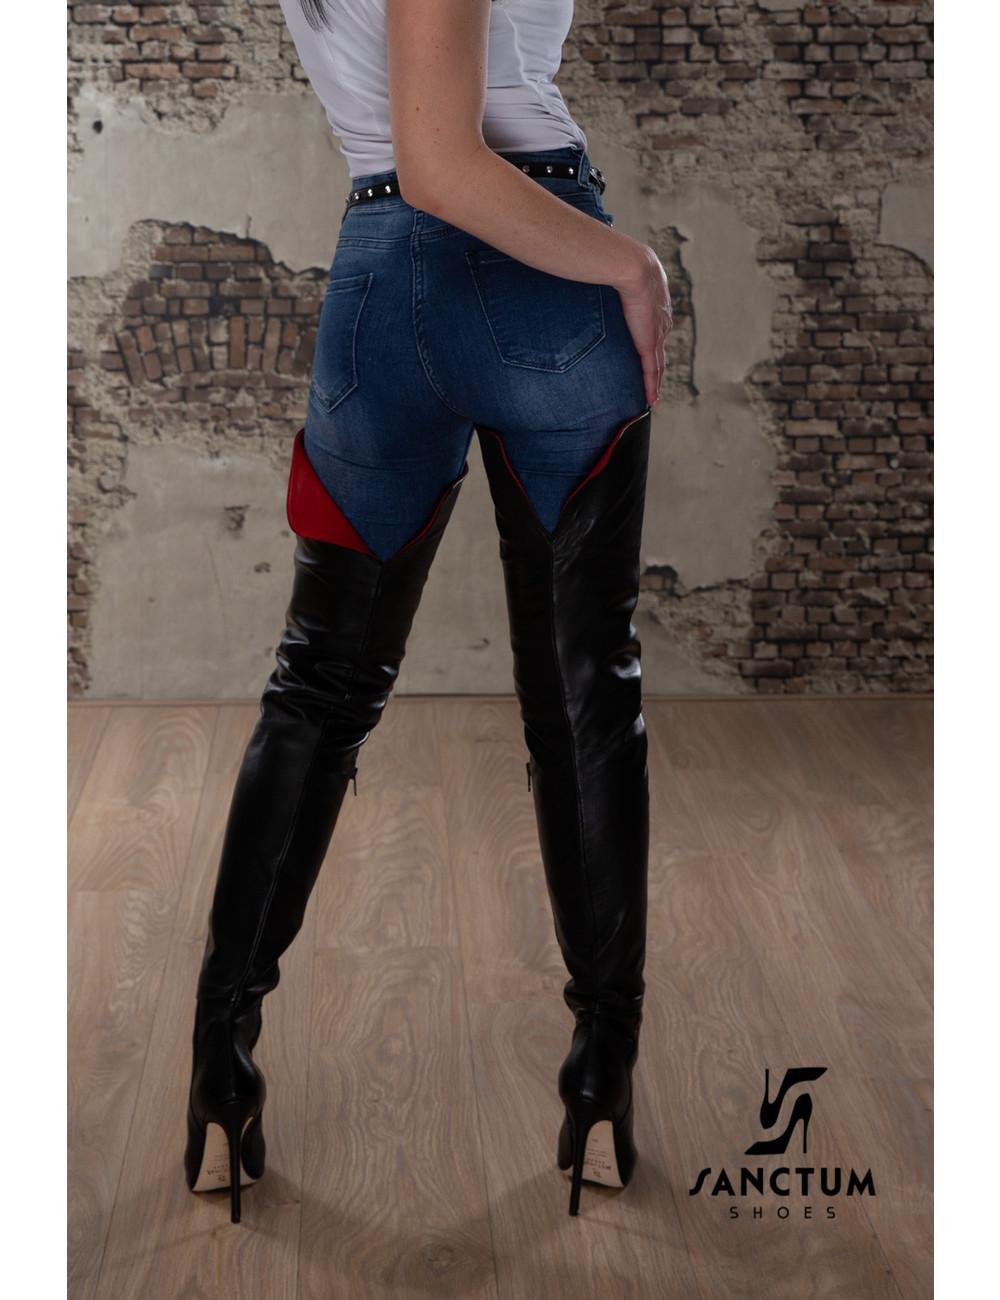 Sanctum  Anita in crotch high VESTA boots